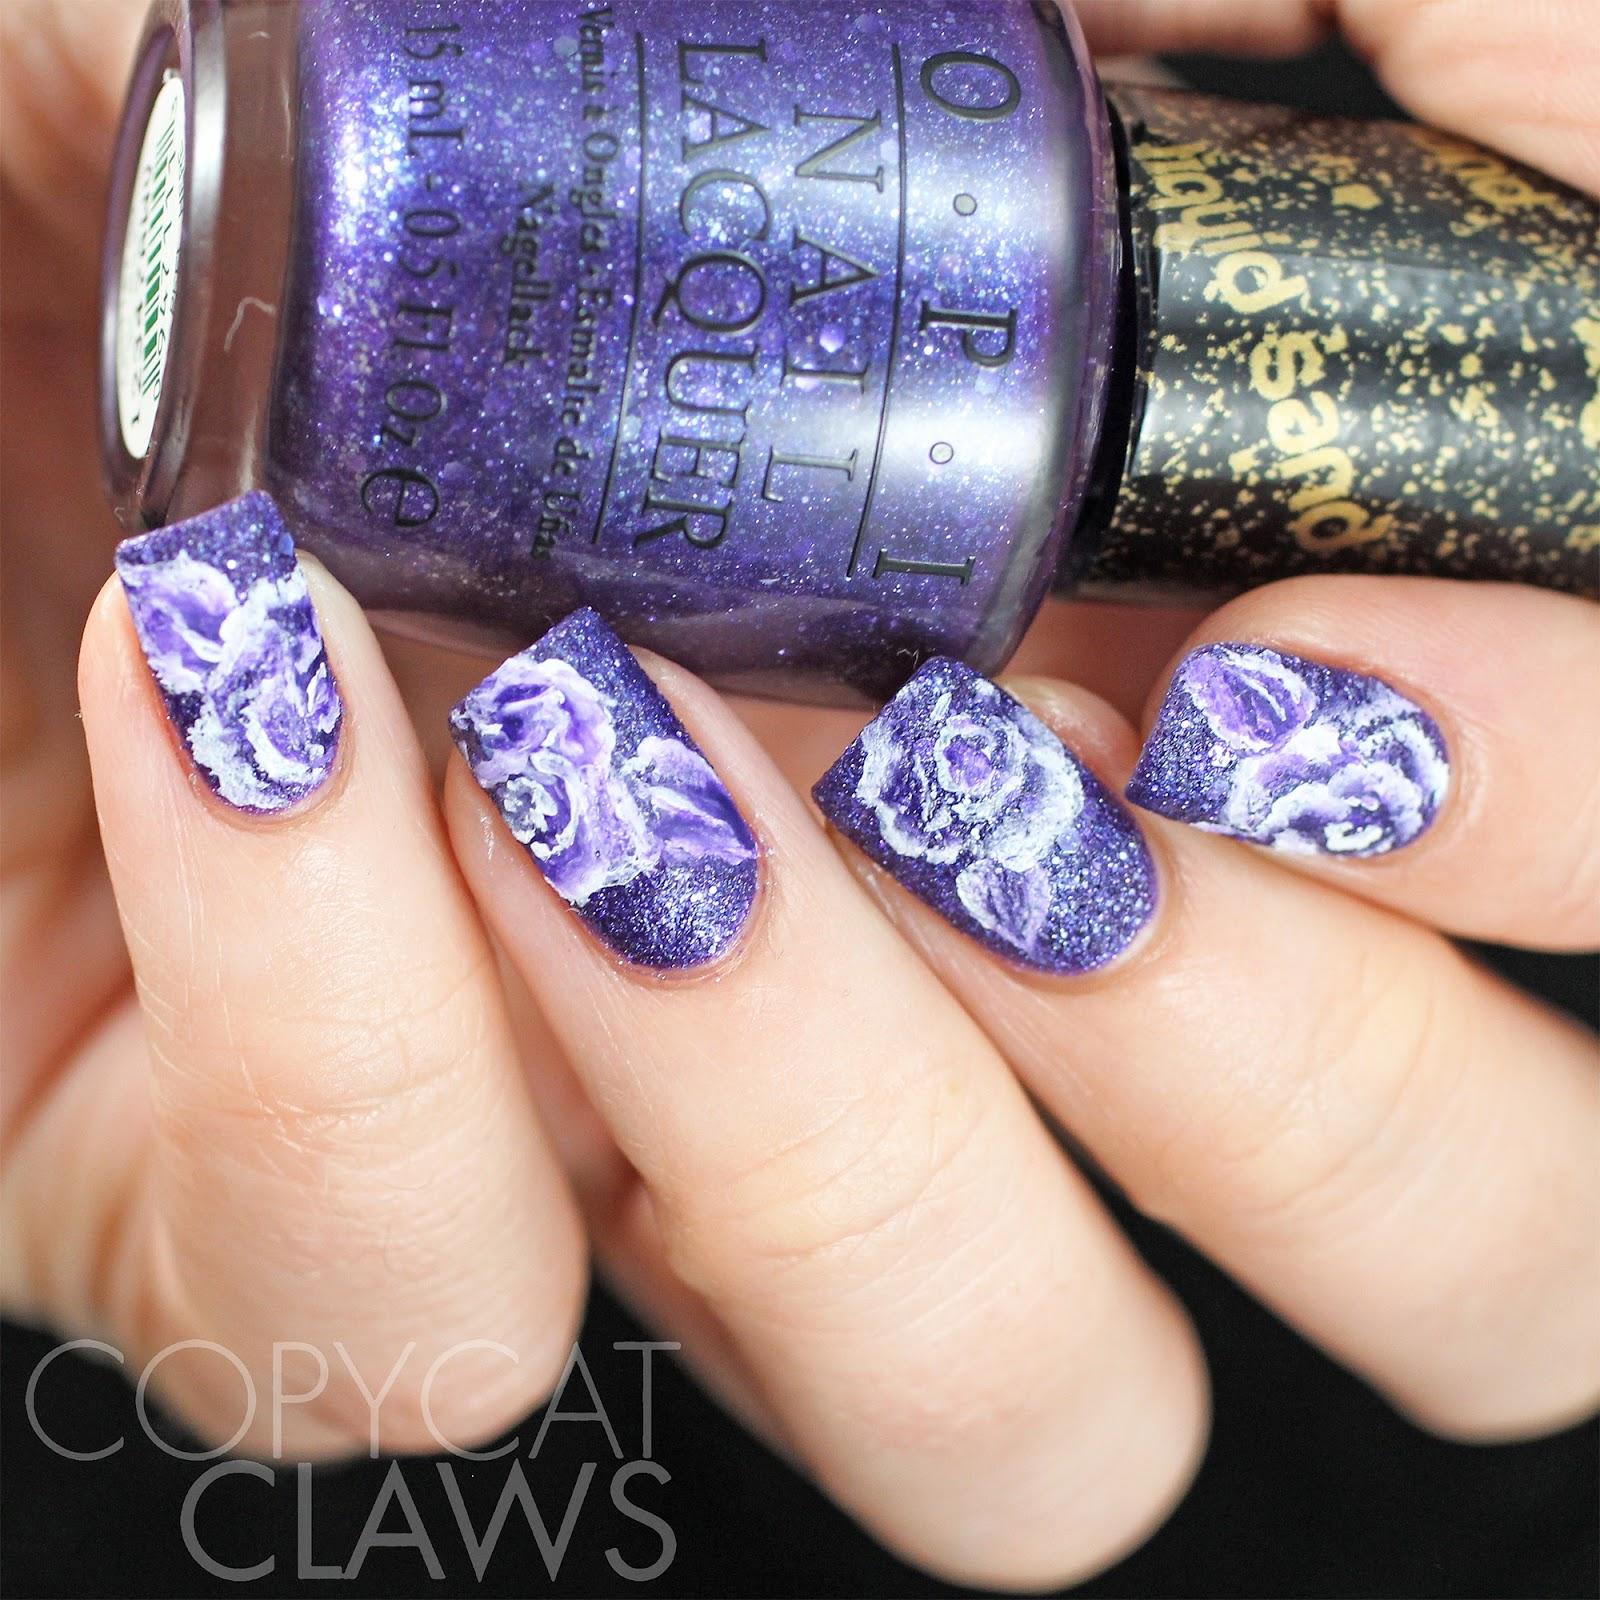 Nail art color violet - 40 Great Nail Art Ideas Violet